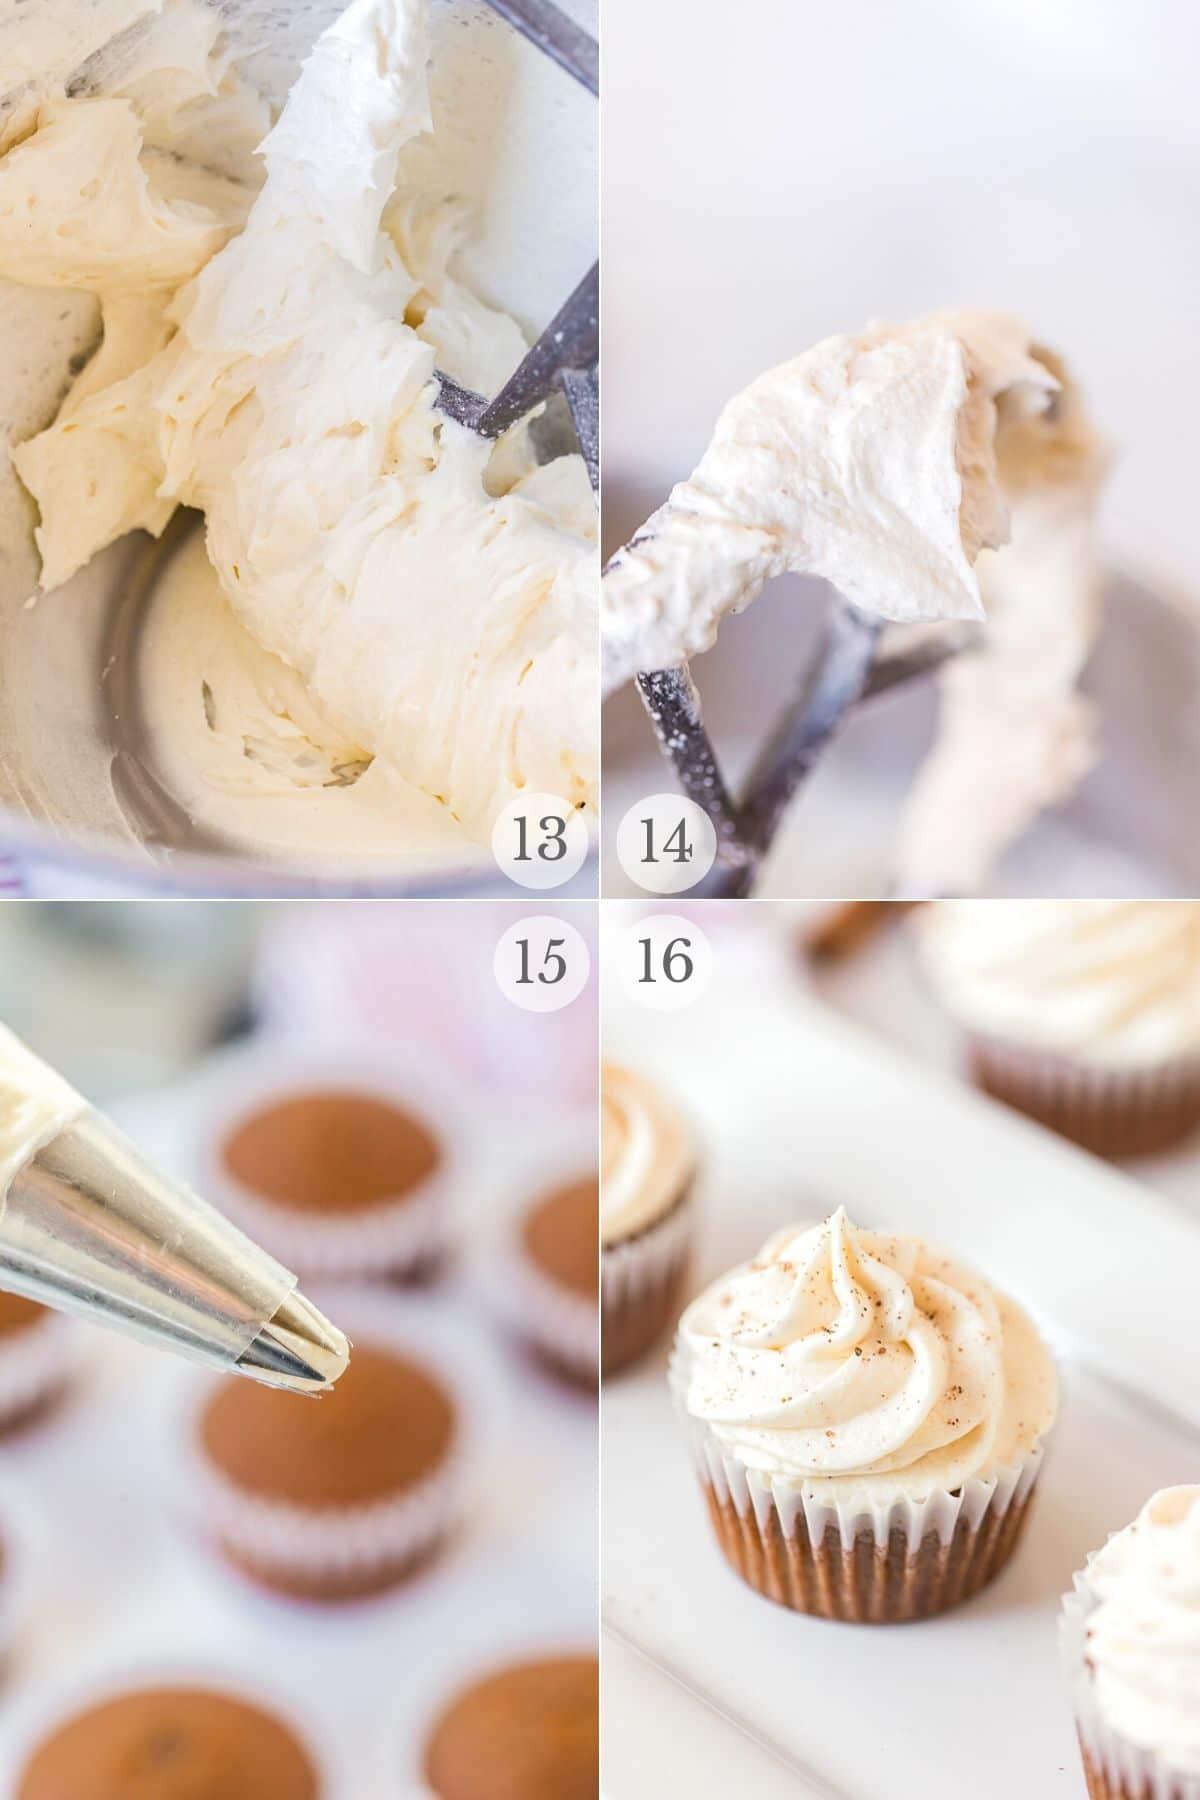 gingerbread cupcakes recipe steps 13-16